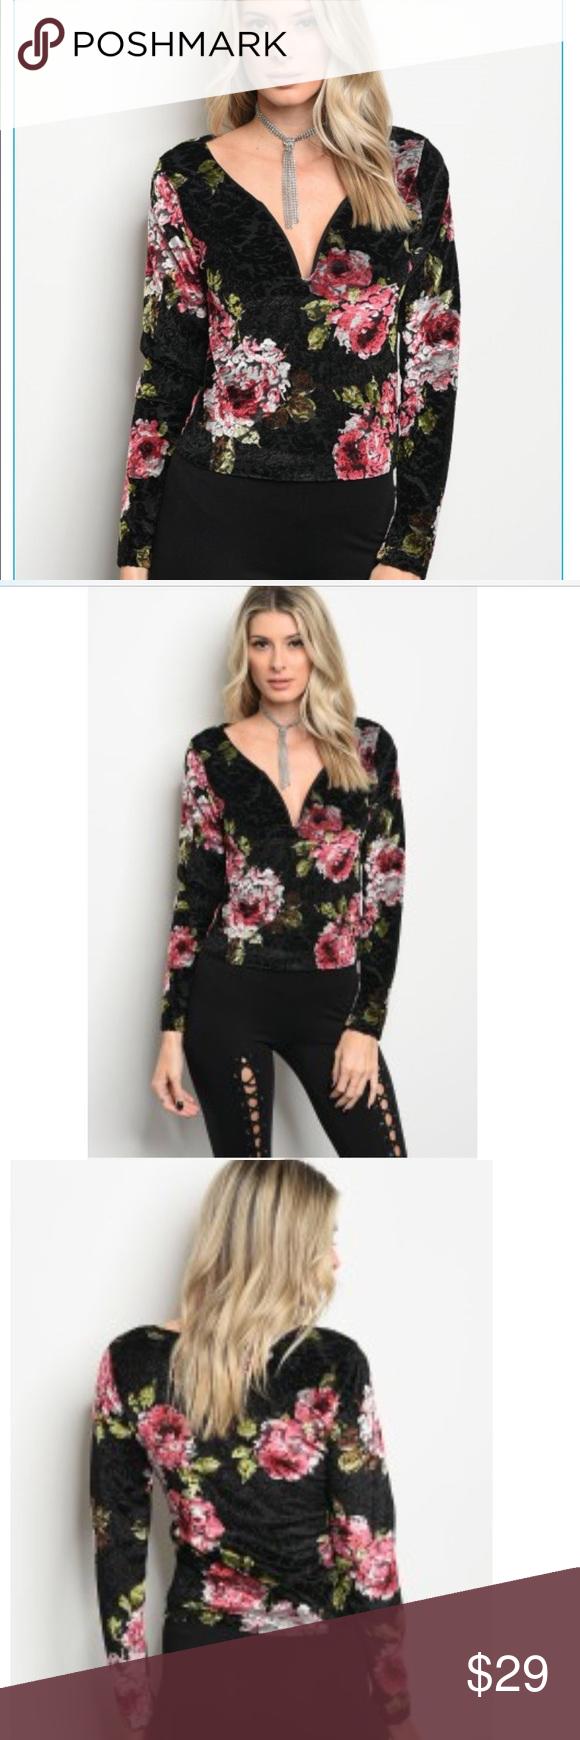 496c6597801 Arriving💕Black Velvet Floral Top Gorgeous black velvet top with floral  pattern! Loving the crushed velvet look this season!! Dress up or down!!  Sizes Small ...